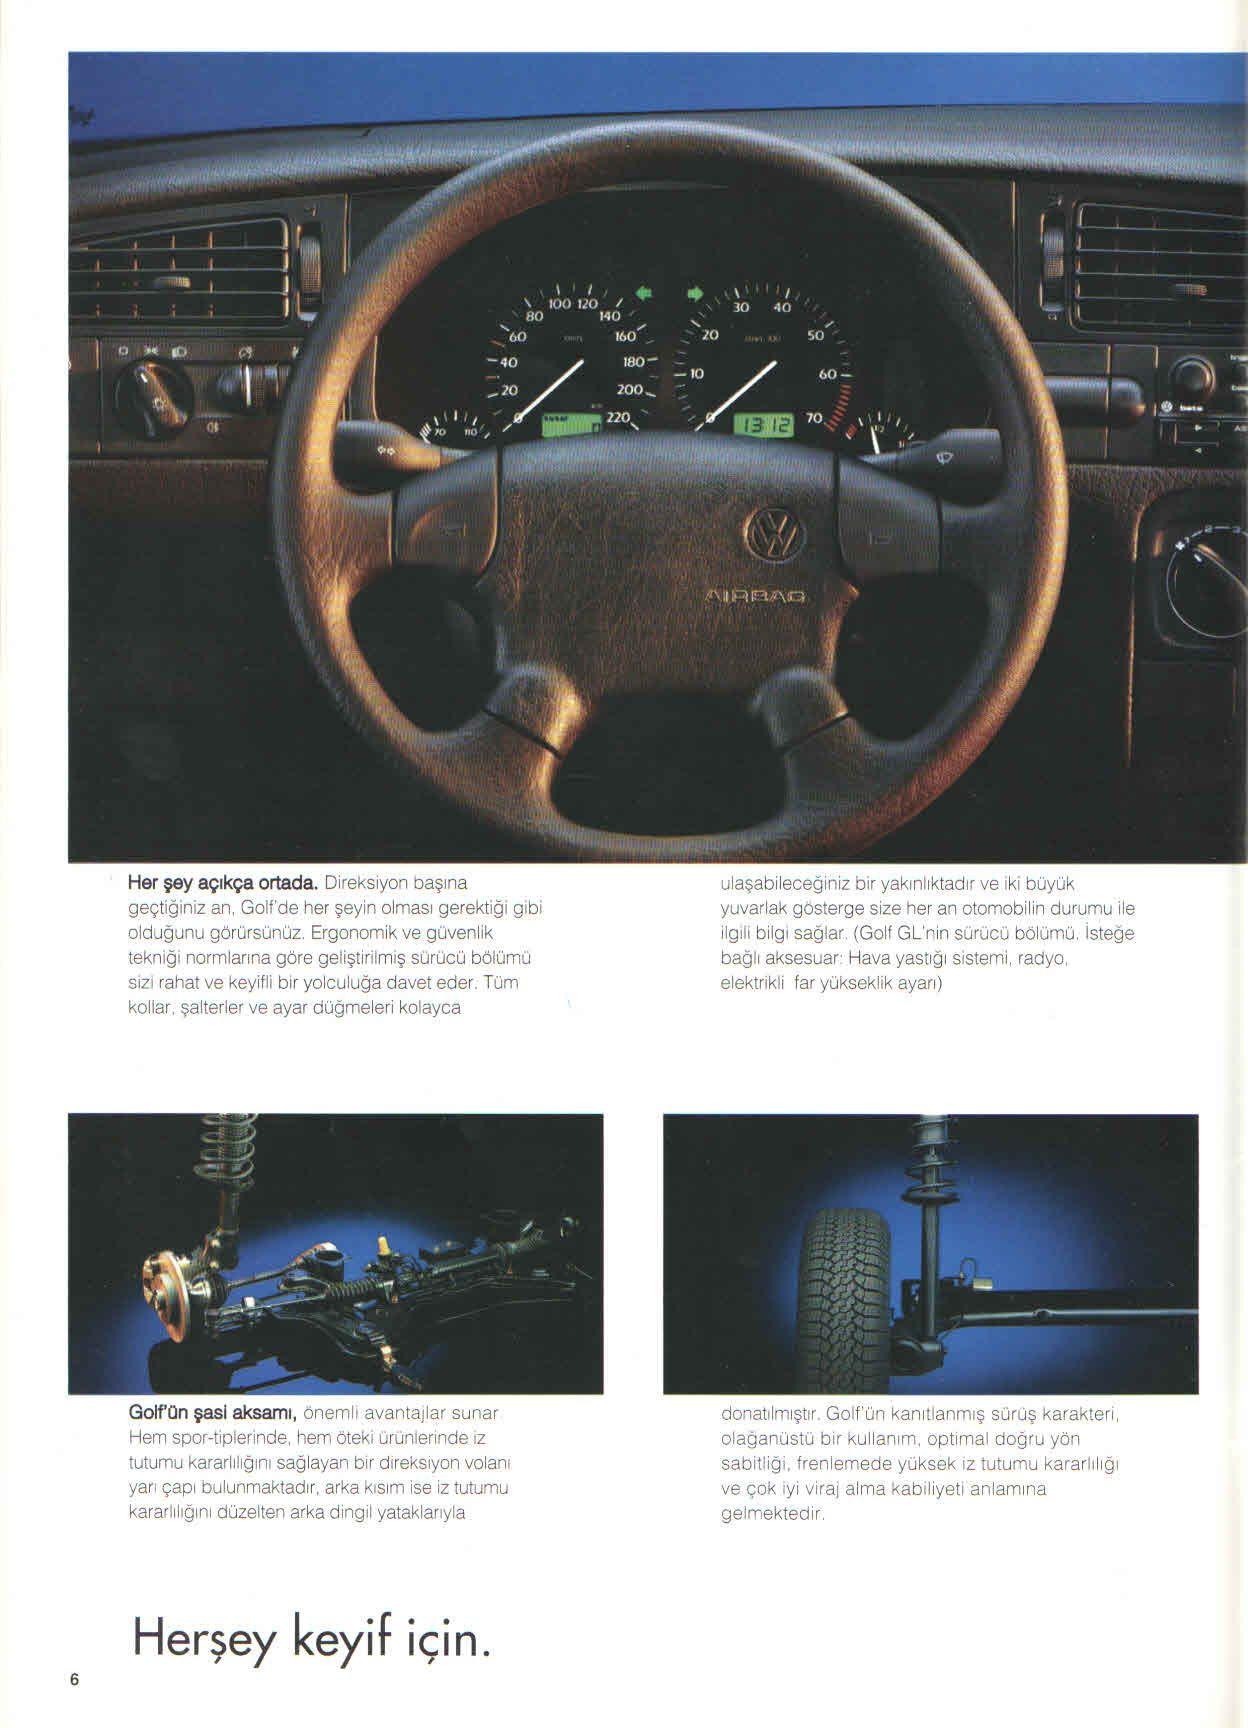 1996 Volkswagen Golf Mk3 Turkish Brochure Catalog Page 6 40 1996 Volkswagen Golf Mk3 Turkce Brosur Katalog Sayf Volkswagen Golf Volkswagen Car Volkswagen